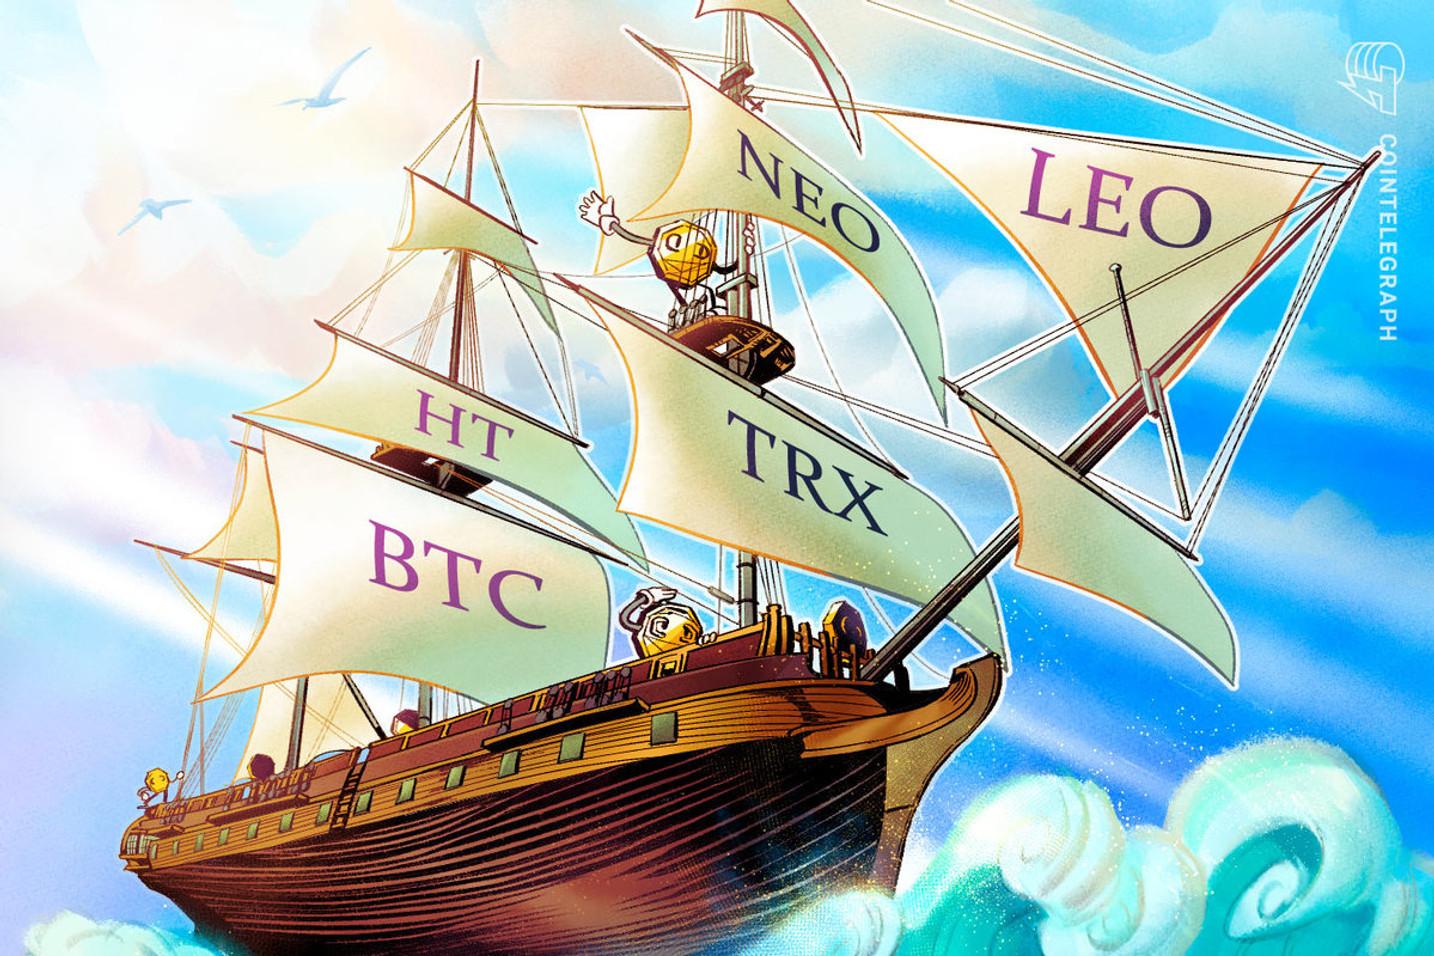 Top-5 Cryptos This Week: HT, BTC, TRX, NEO, LEO